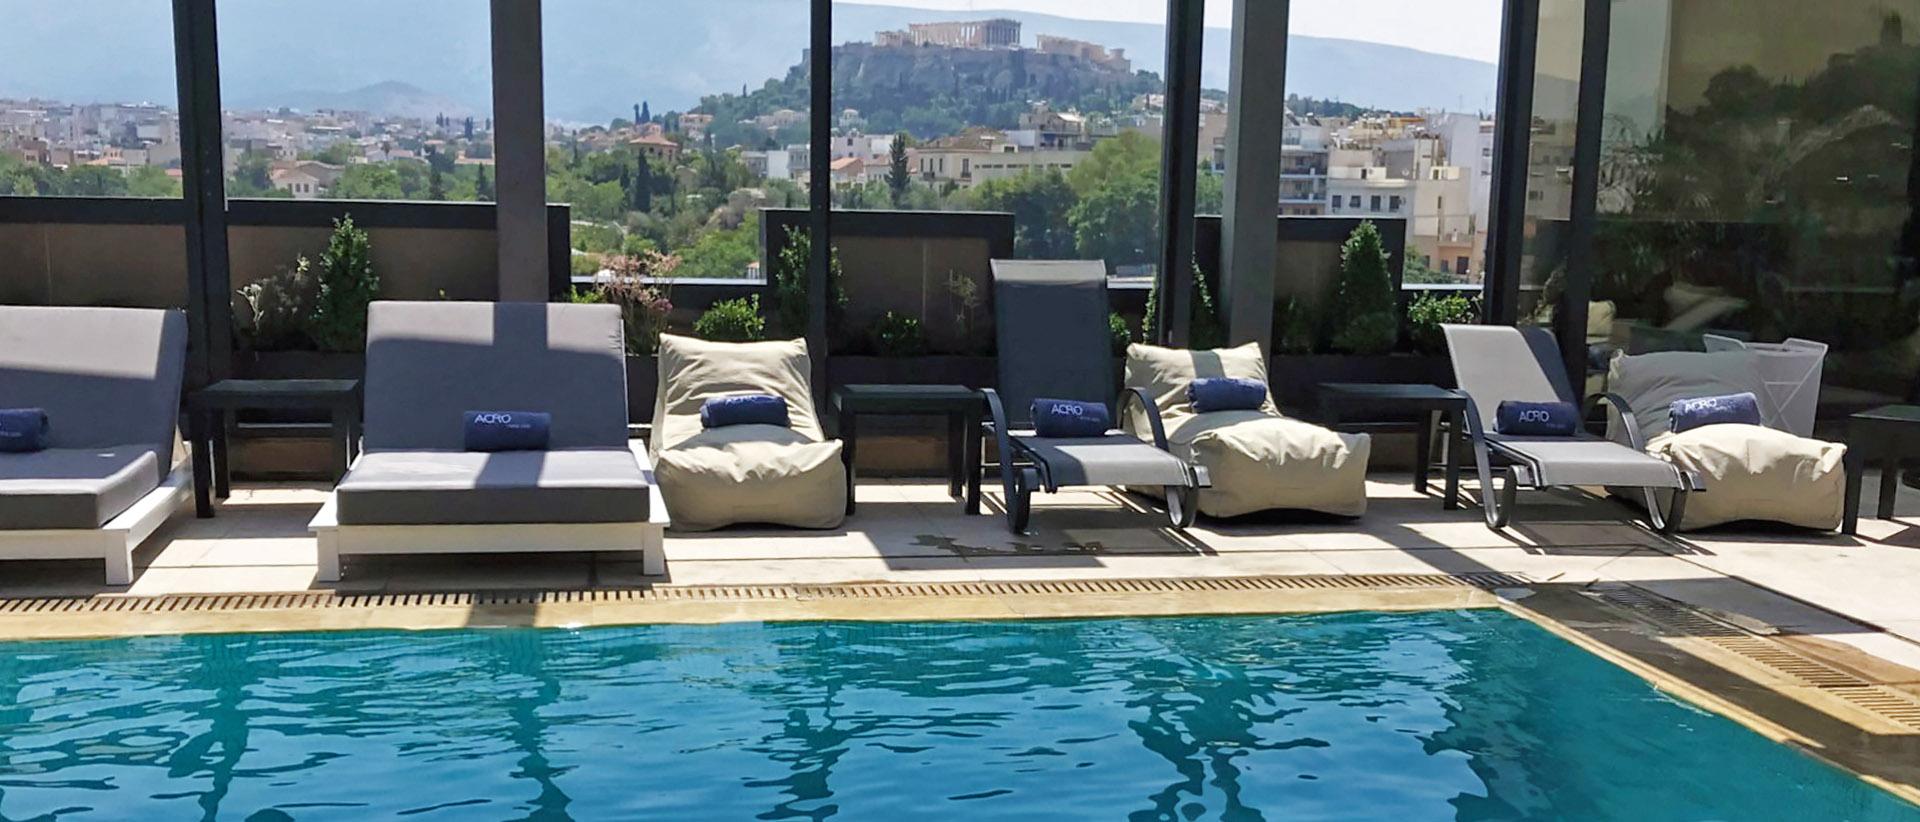 Enjoy your swim, overlooking the Acropolis!